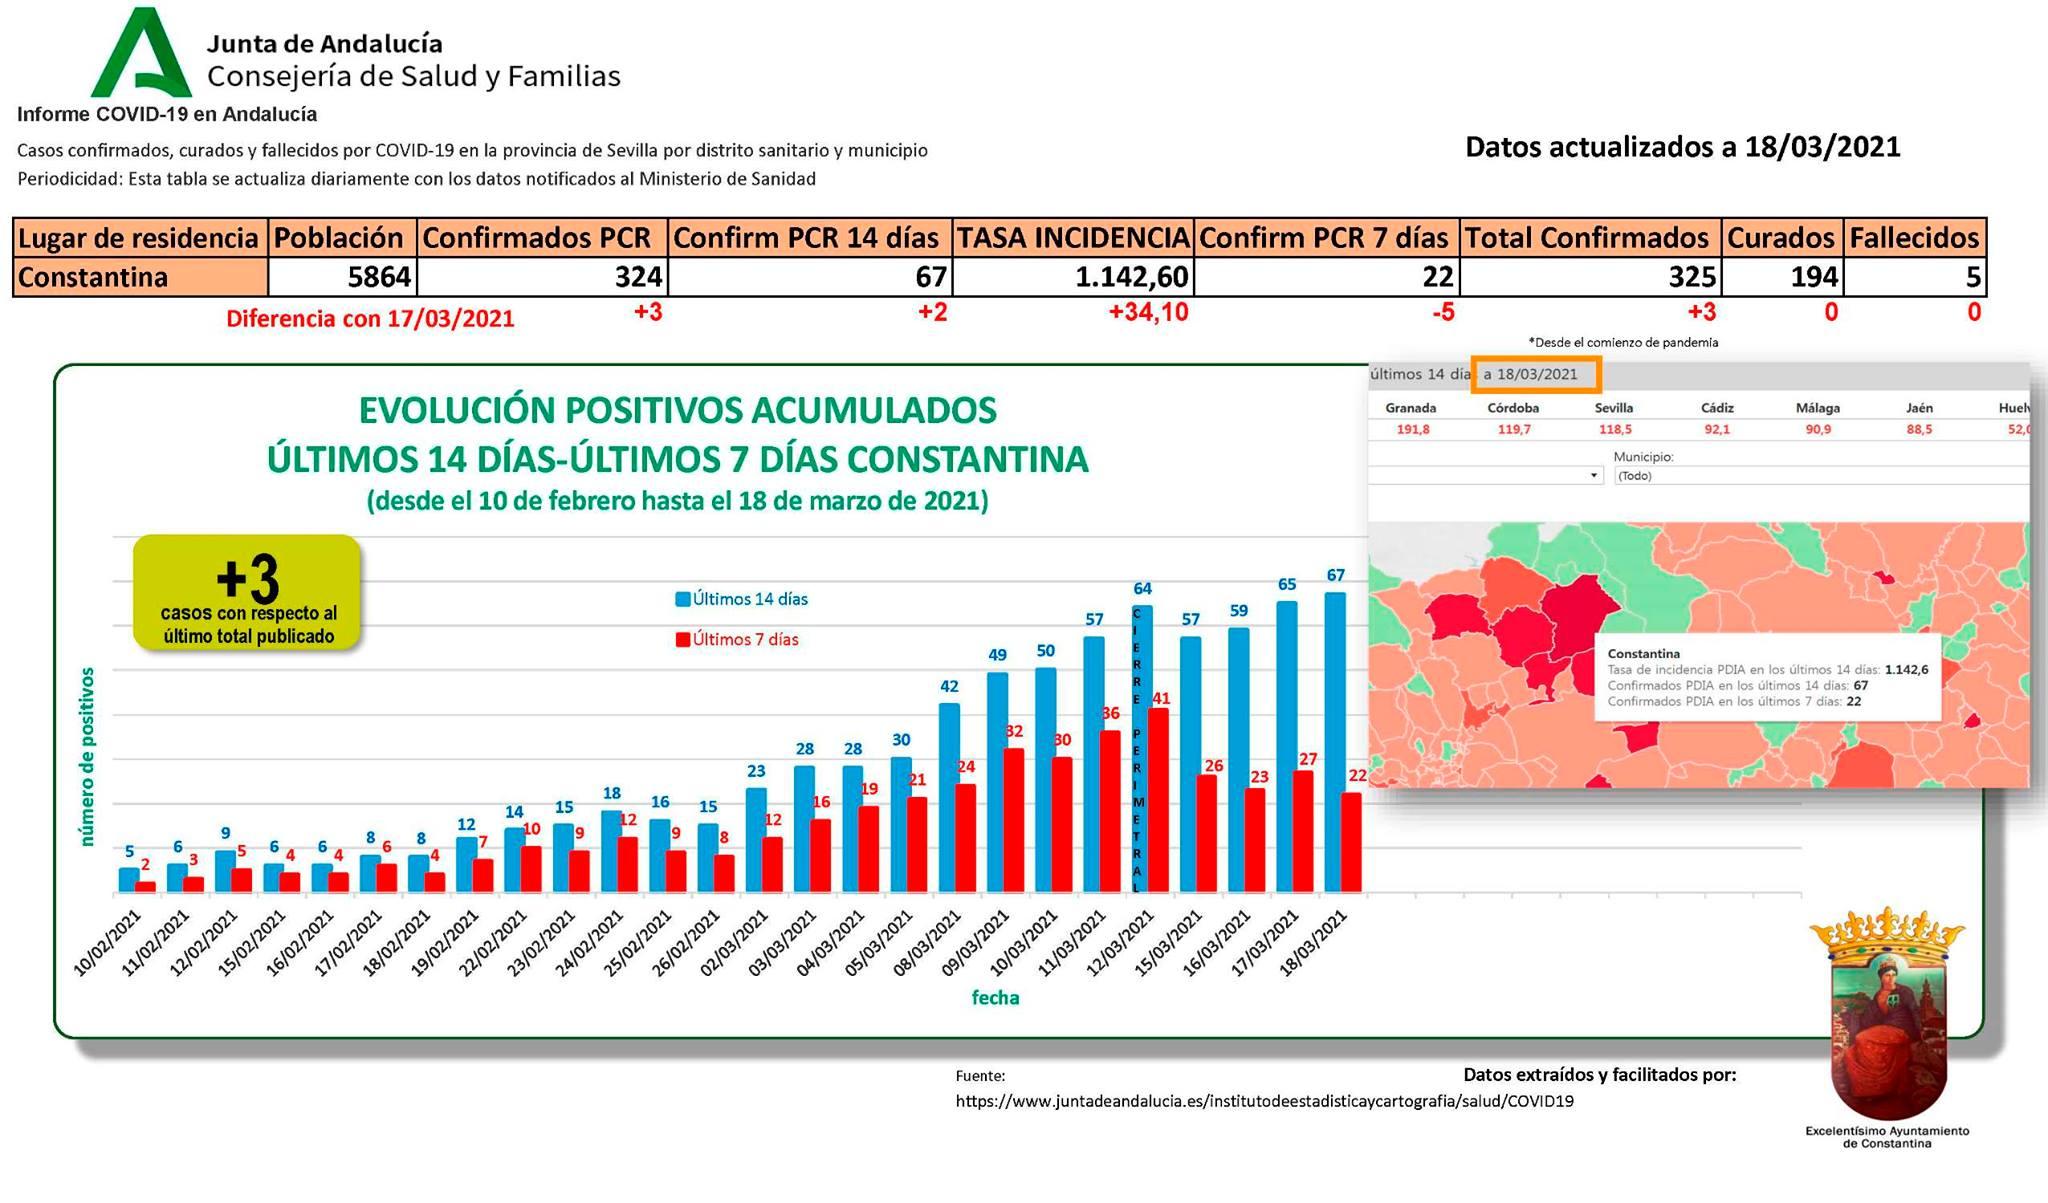 67 casos positivos de COVID-19 (marzo 2021) - Constantina (Sevilla)